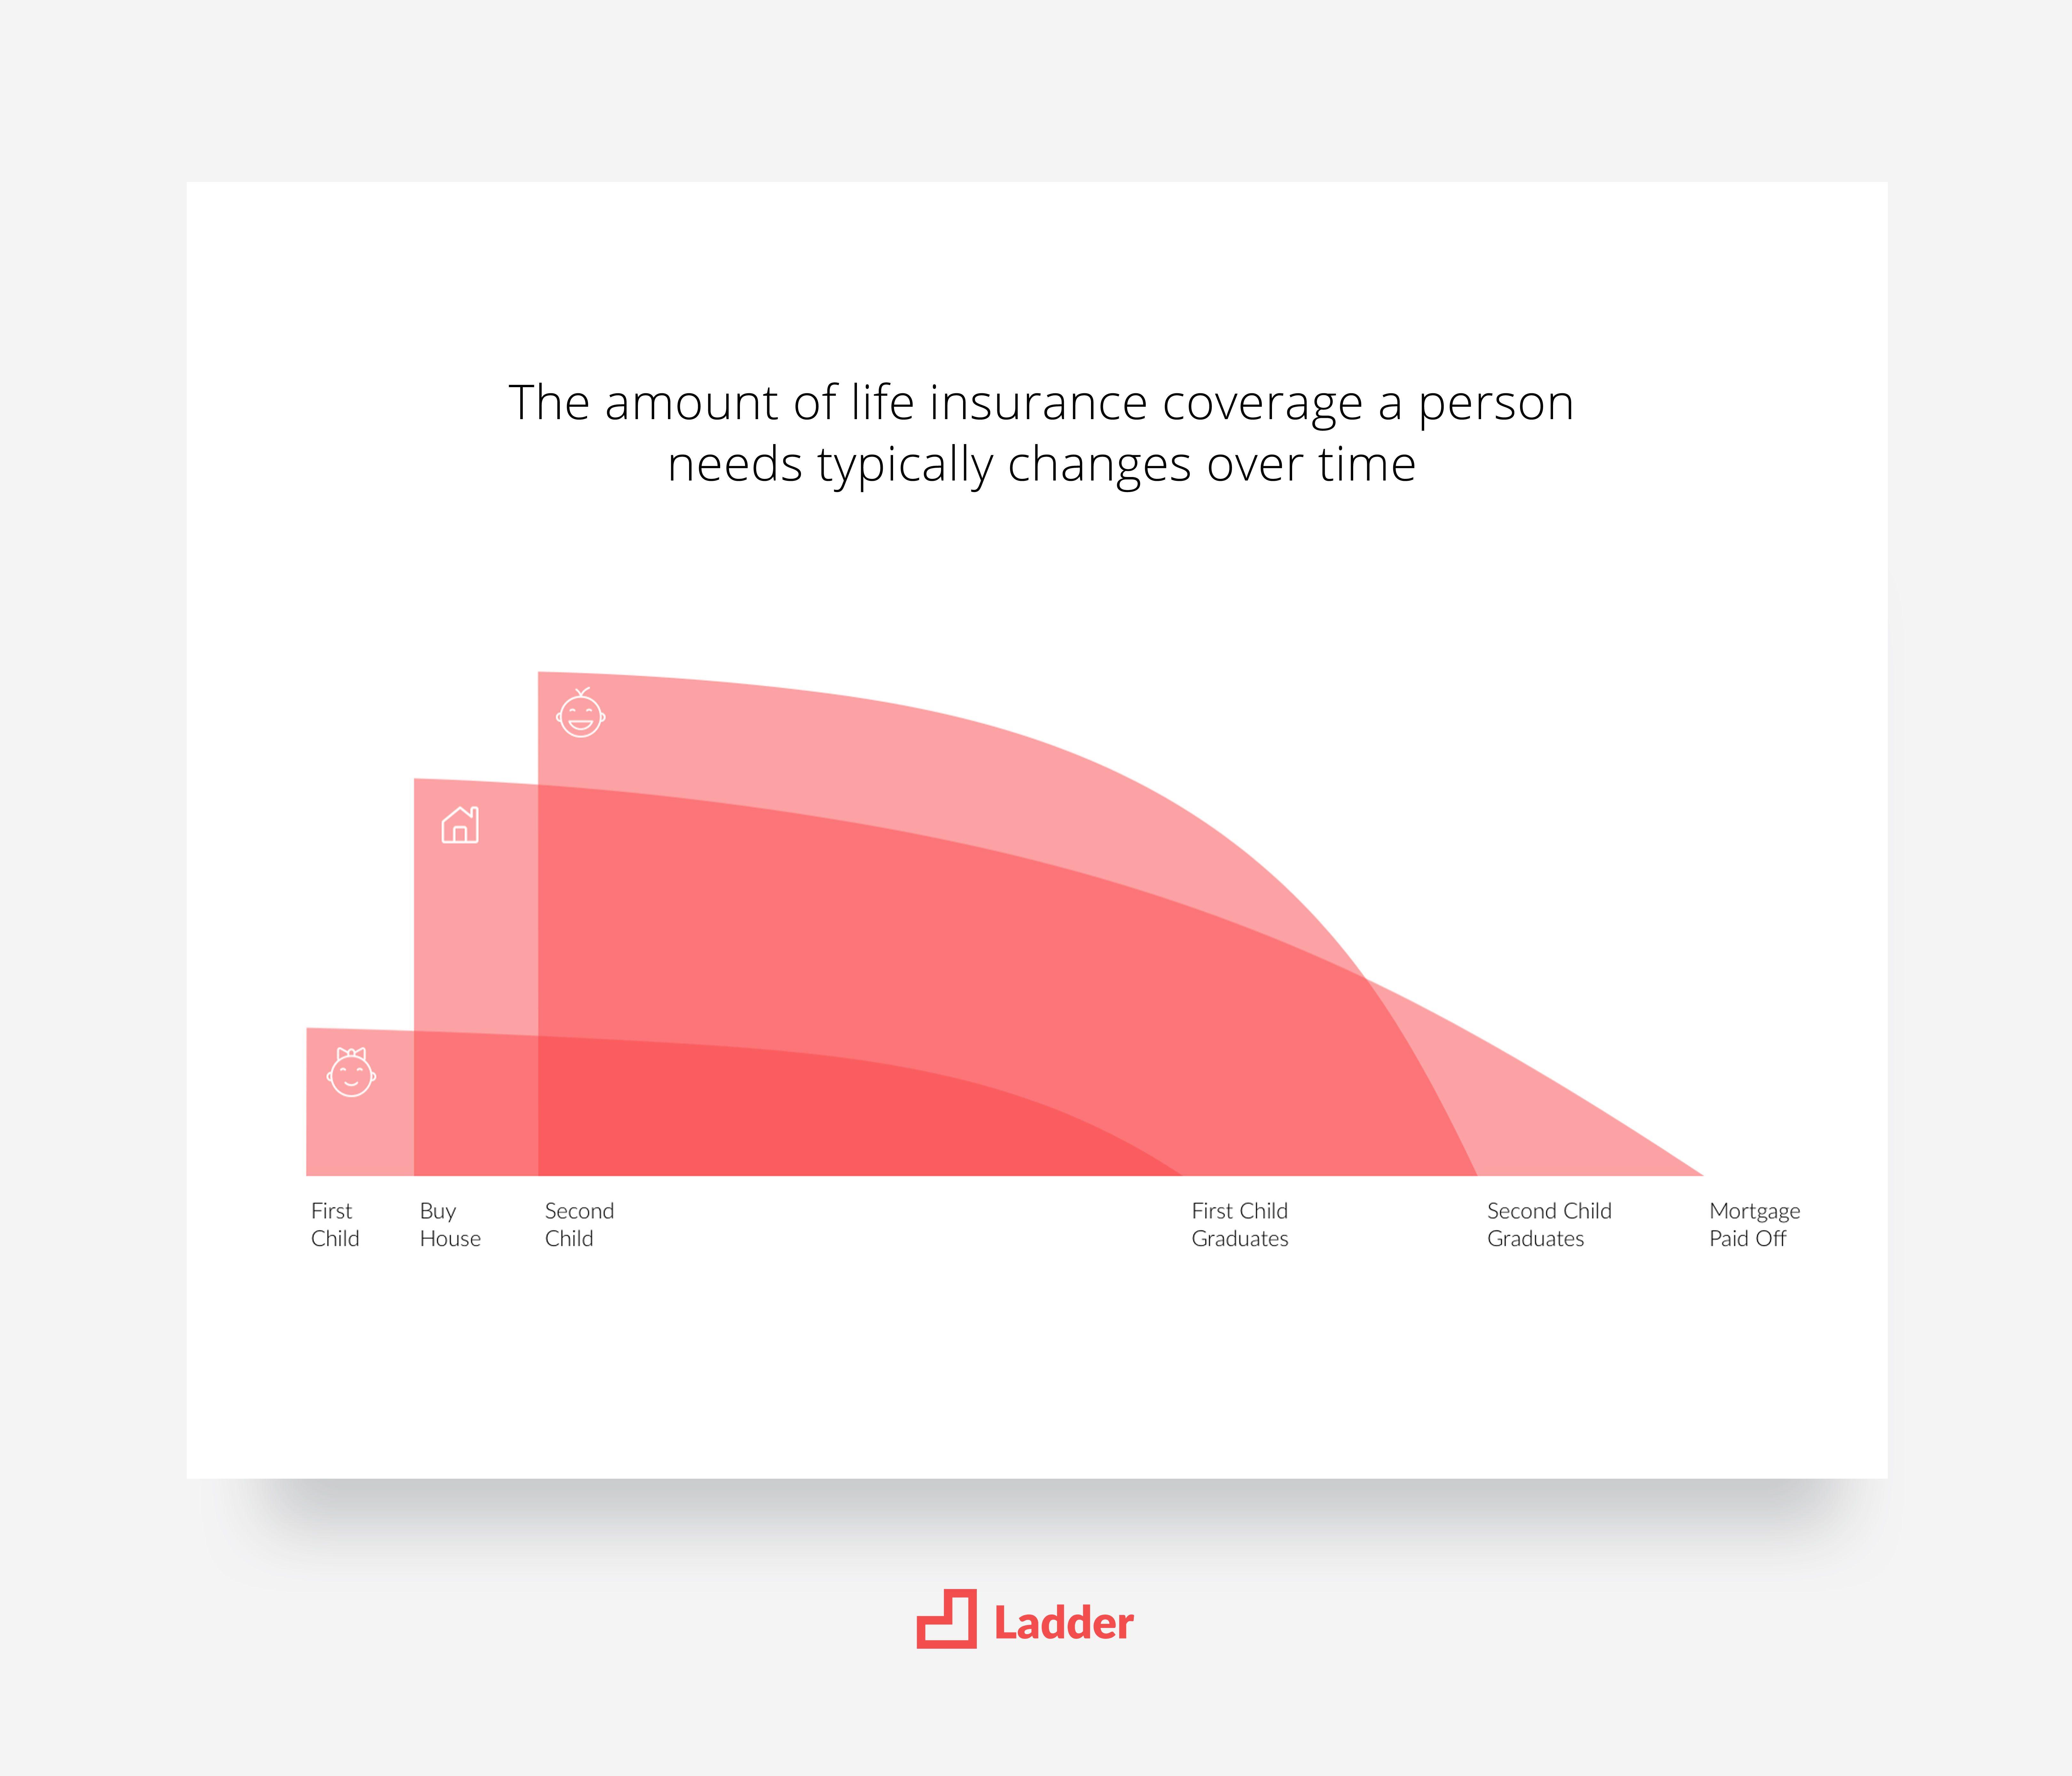 Diagram Design Inspiration From Ladder Life Insurance In 2020 Graph Design Infographic Design Layout Diagram Design